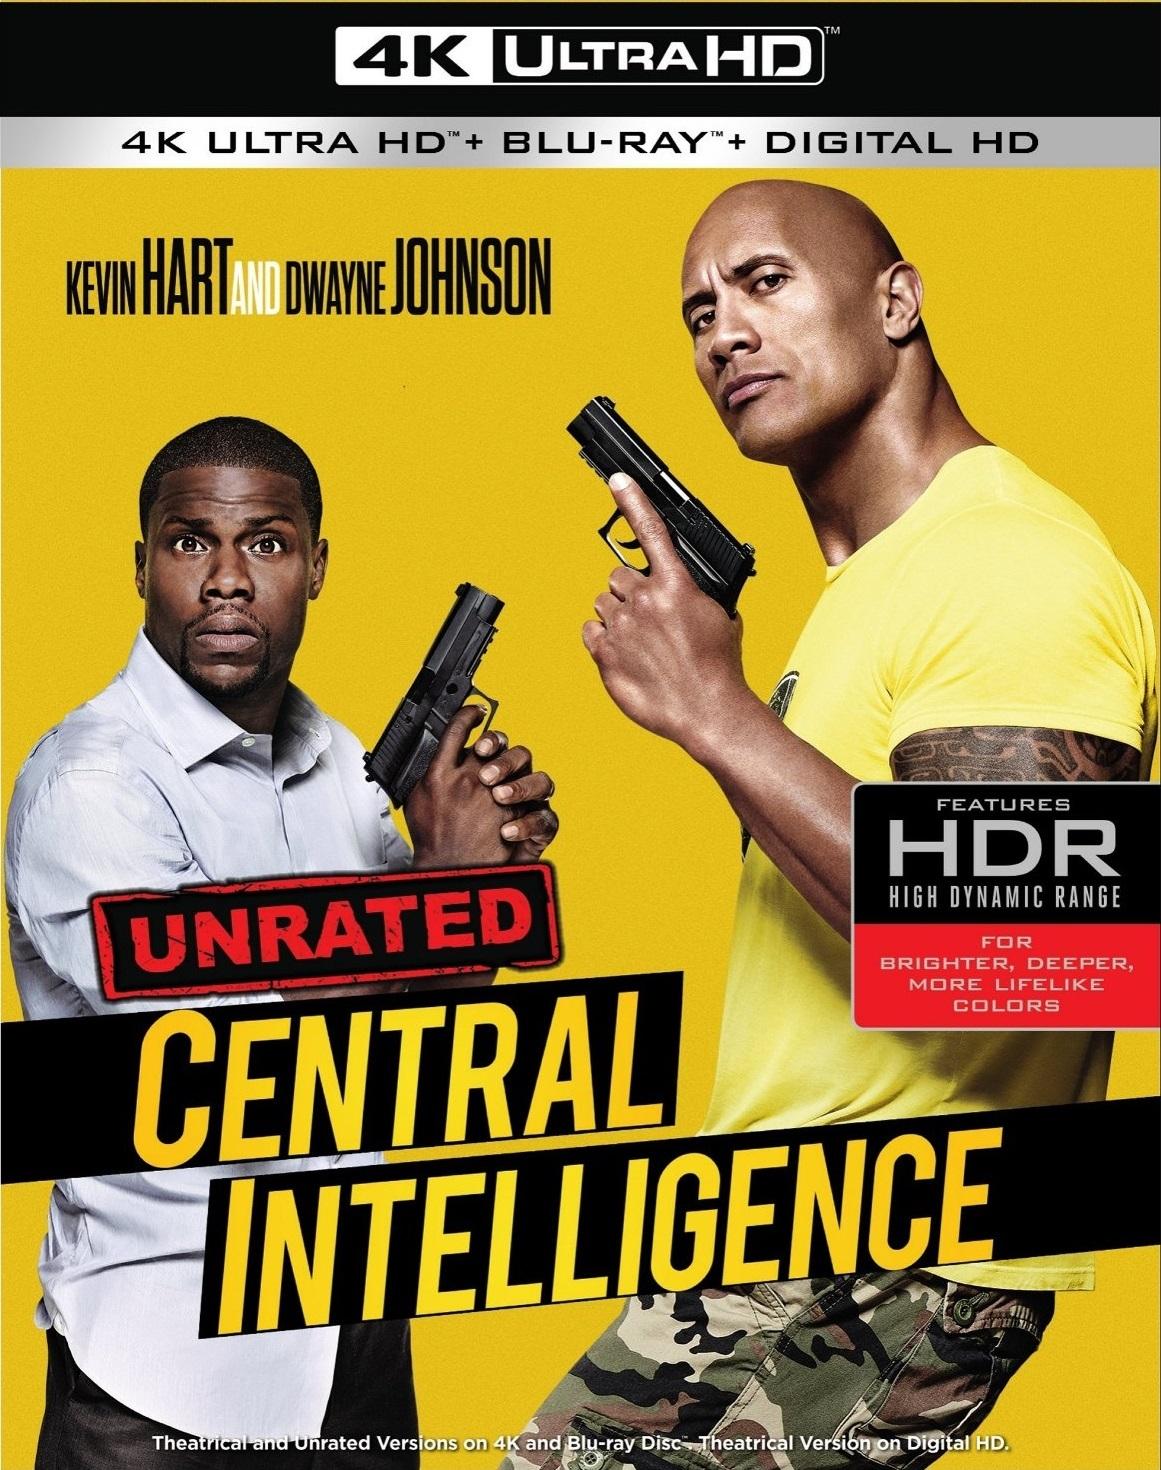 Central Intelligence 2016 4k Ultra Hd Blu Ray